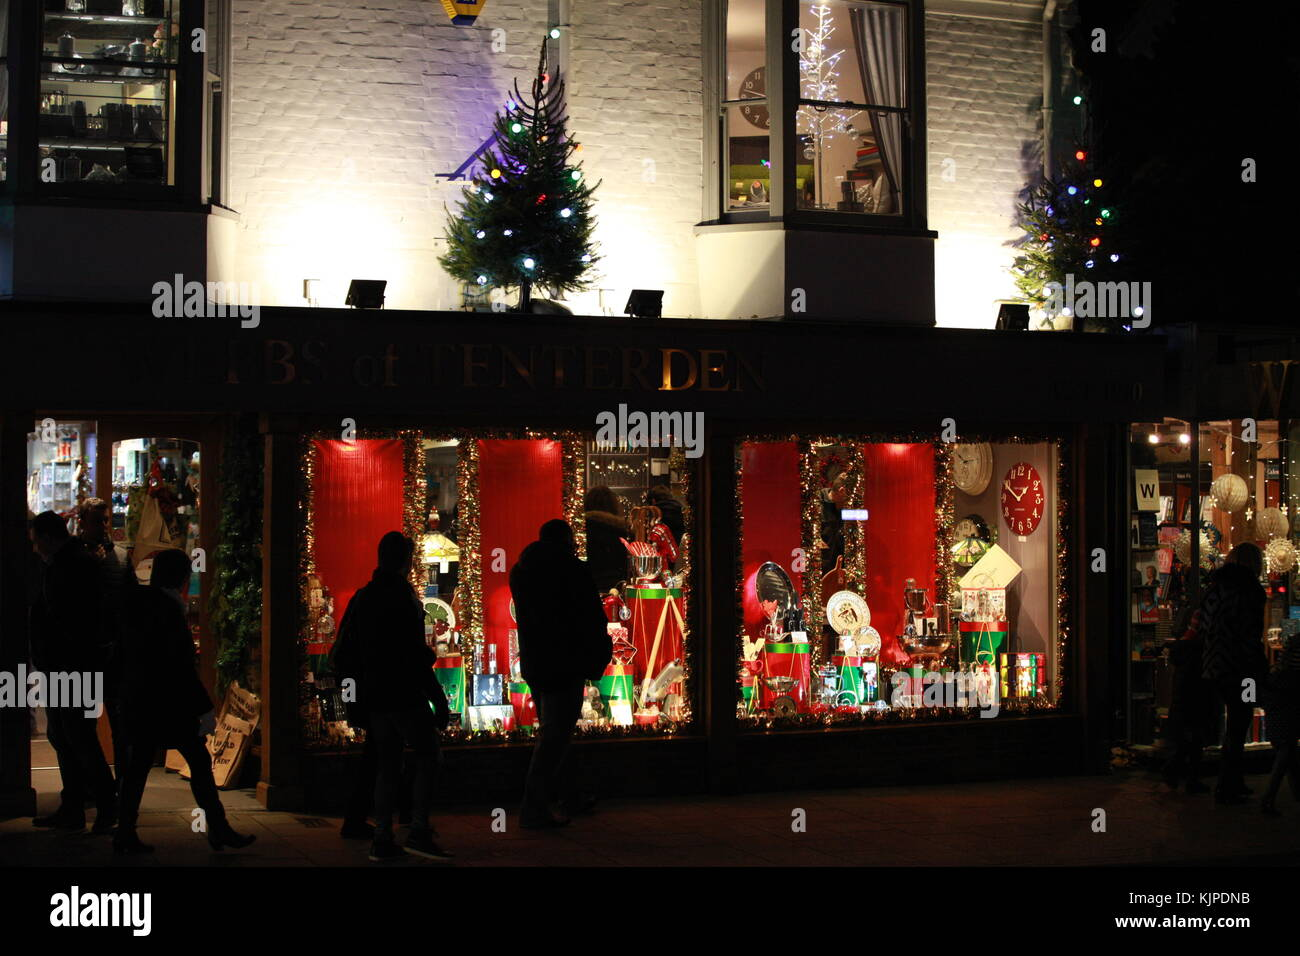 Tenterden, Kent, UK. 25th November 2017. A colourful Christmas Stock ...